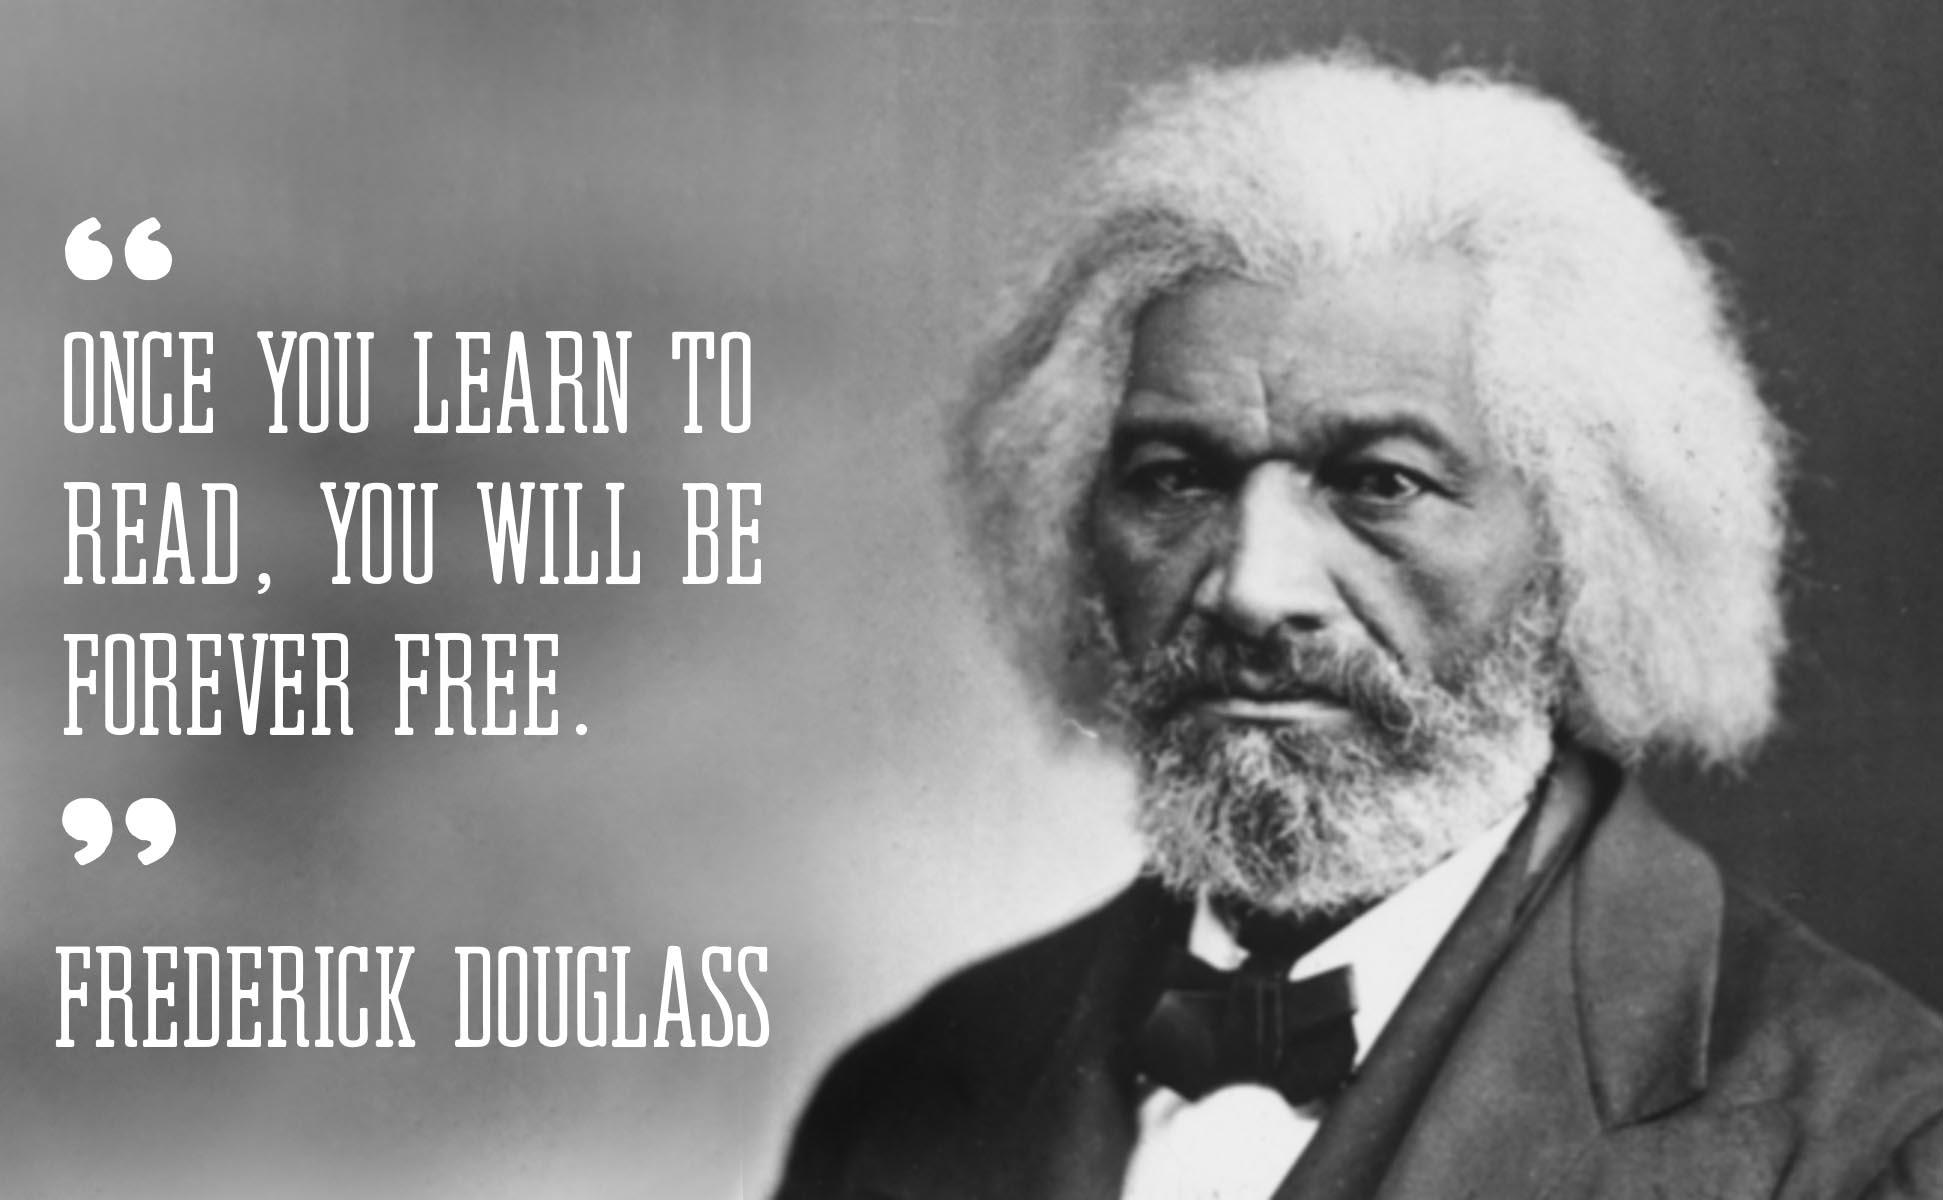 Frederick Douglass Quotes 5 Frederick Douglass Quotes Worth Reading On His Birthday | Office  Frederick Douglass Quotes